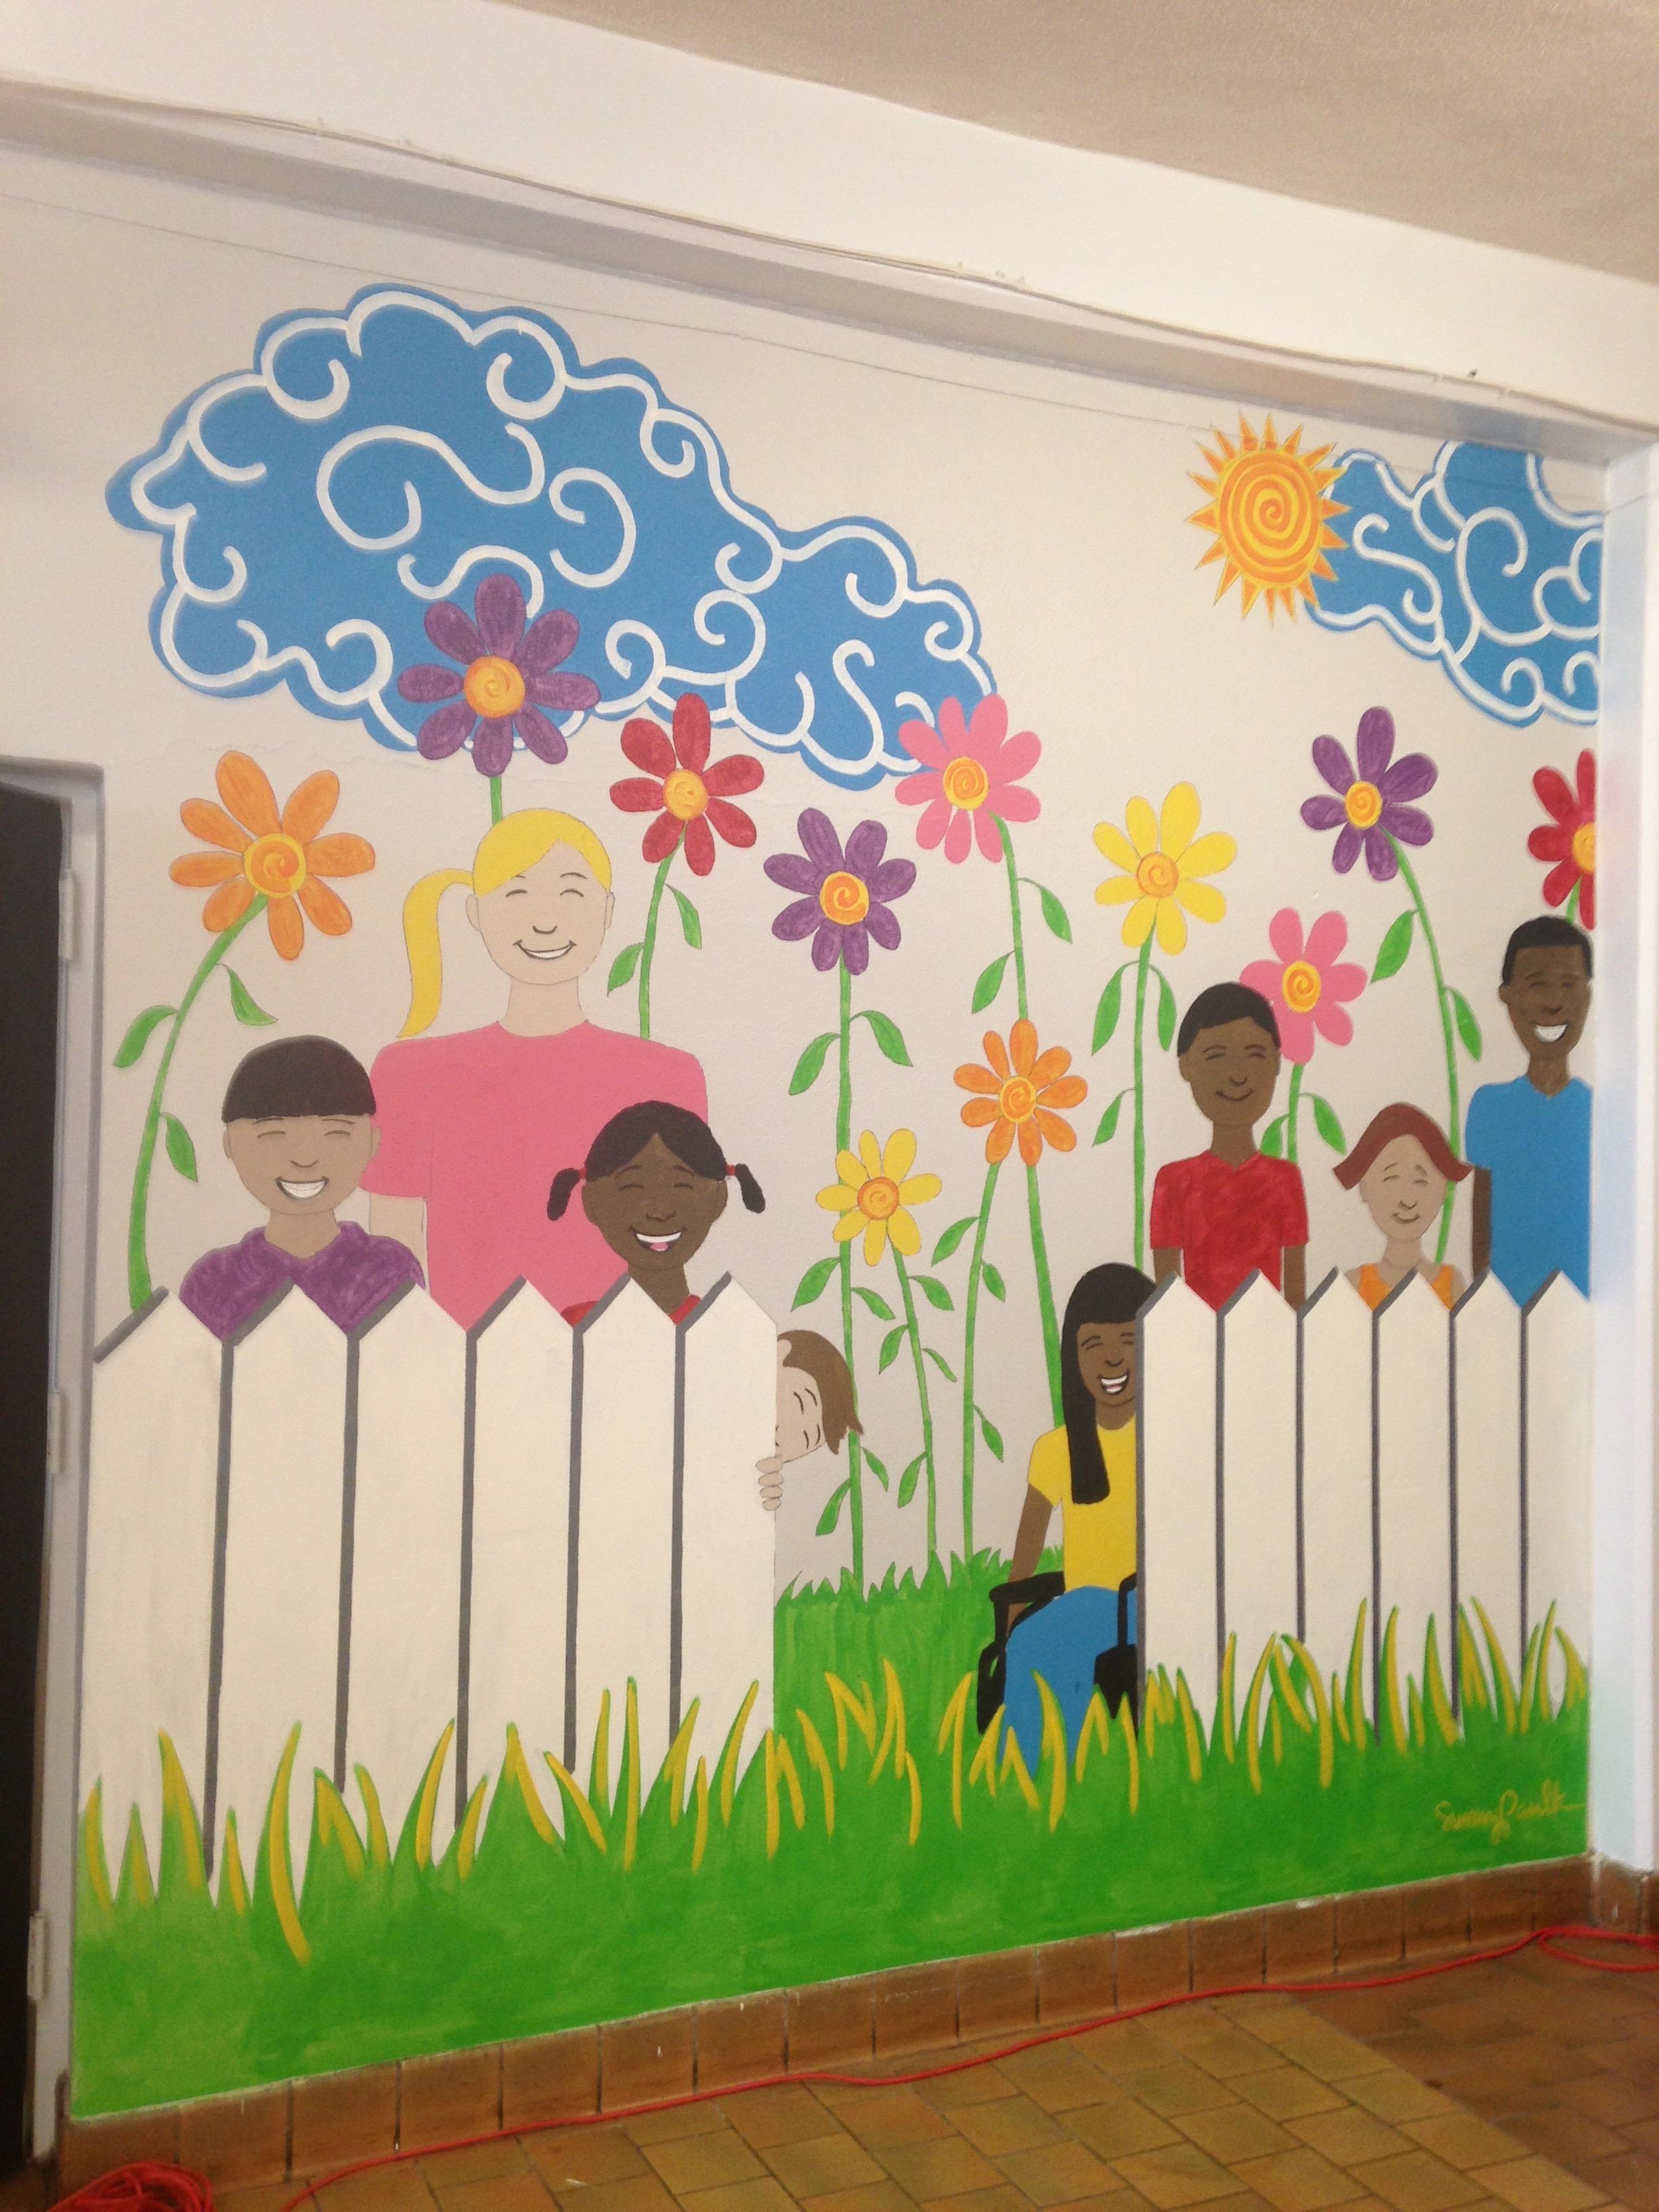 (2/2) mural for Flowers Elementary School, Montgomery, AL. 2017